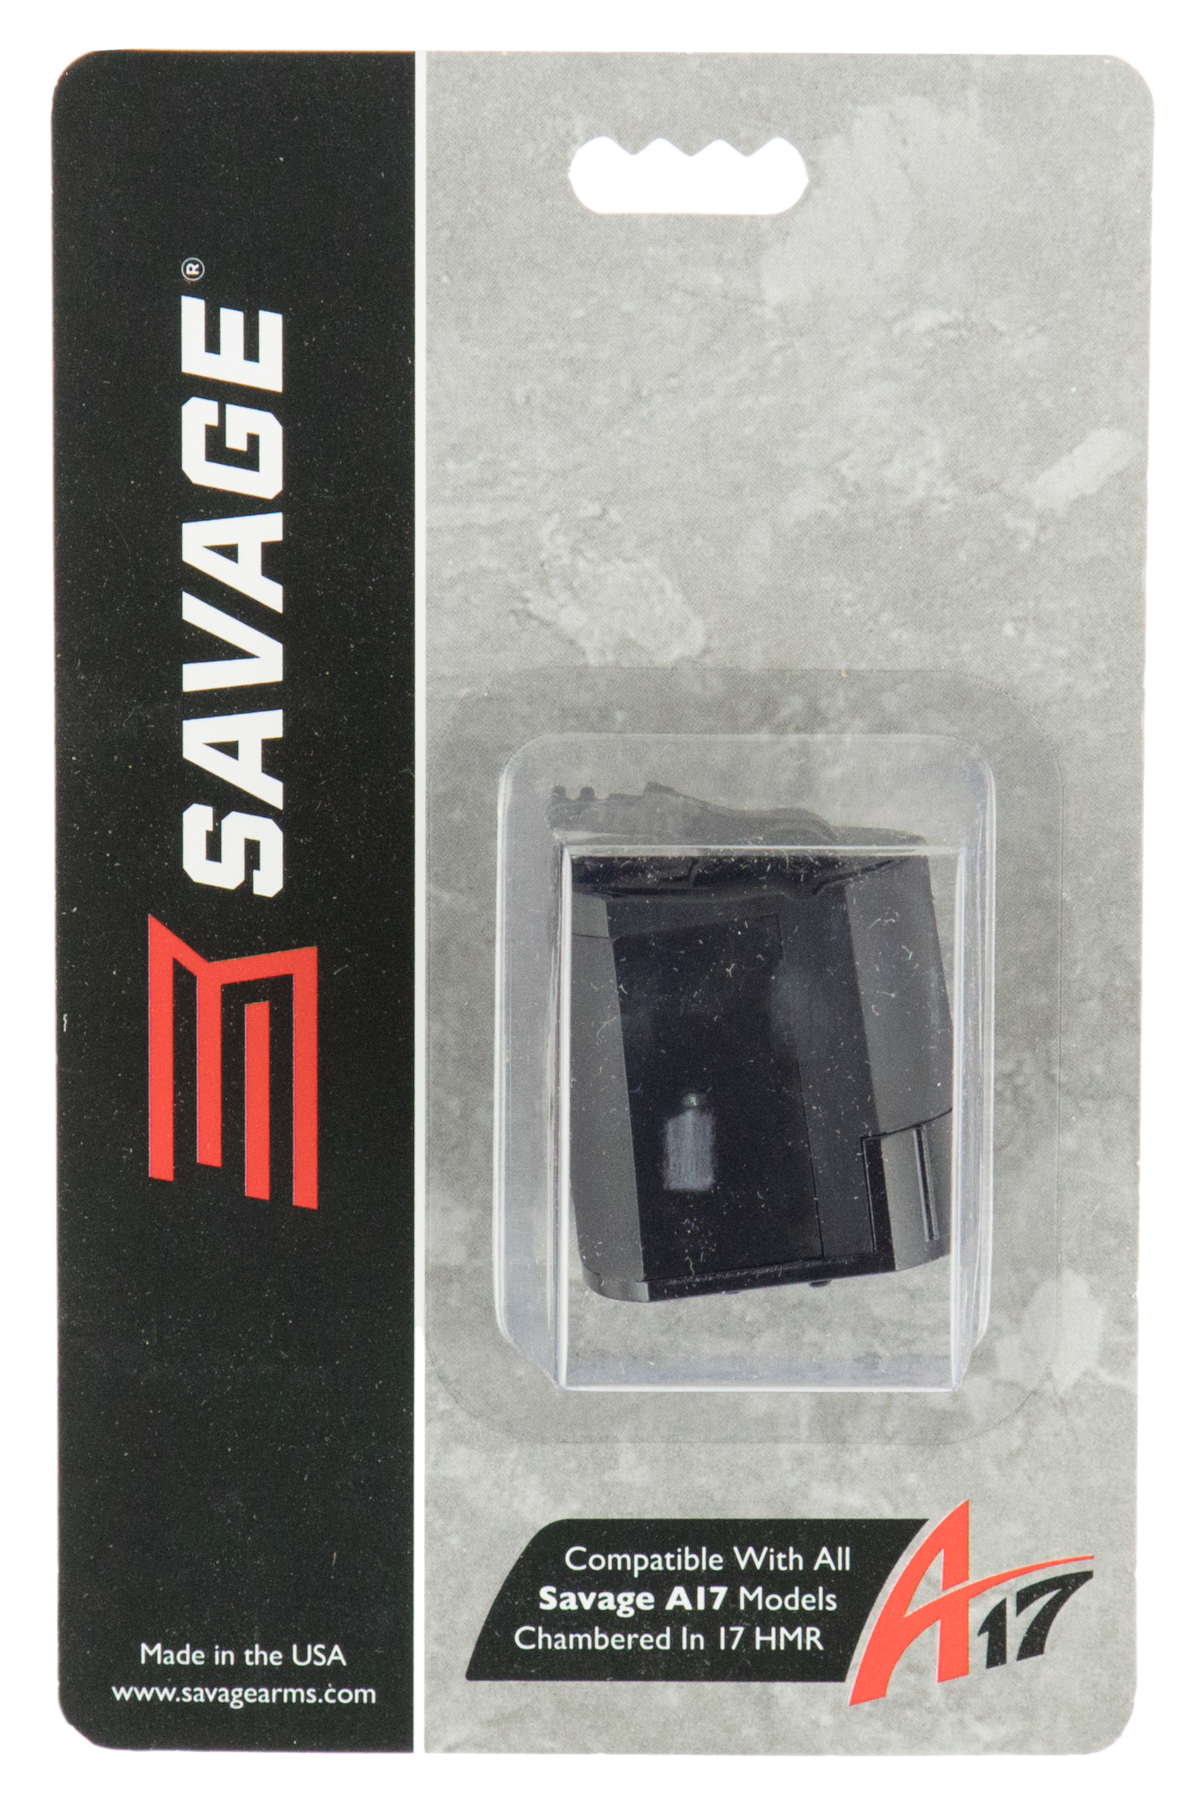 SAVAGE A17